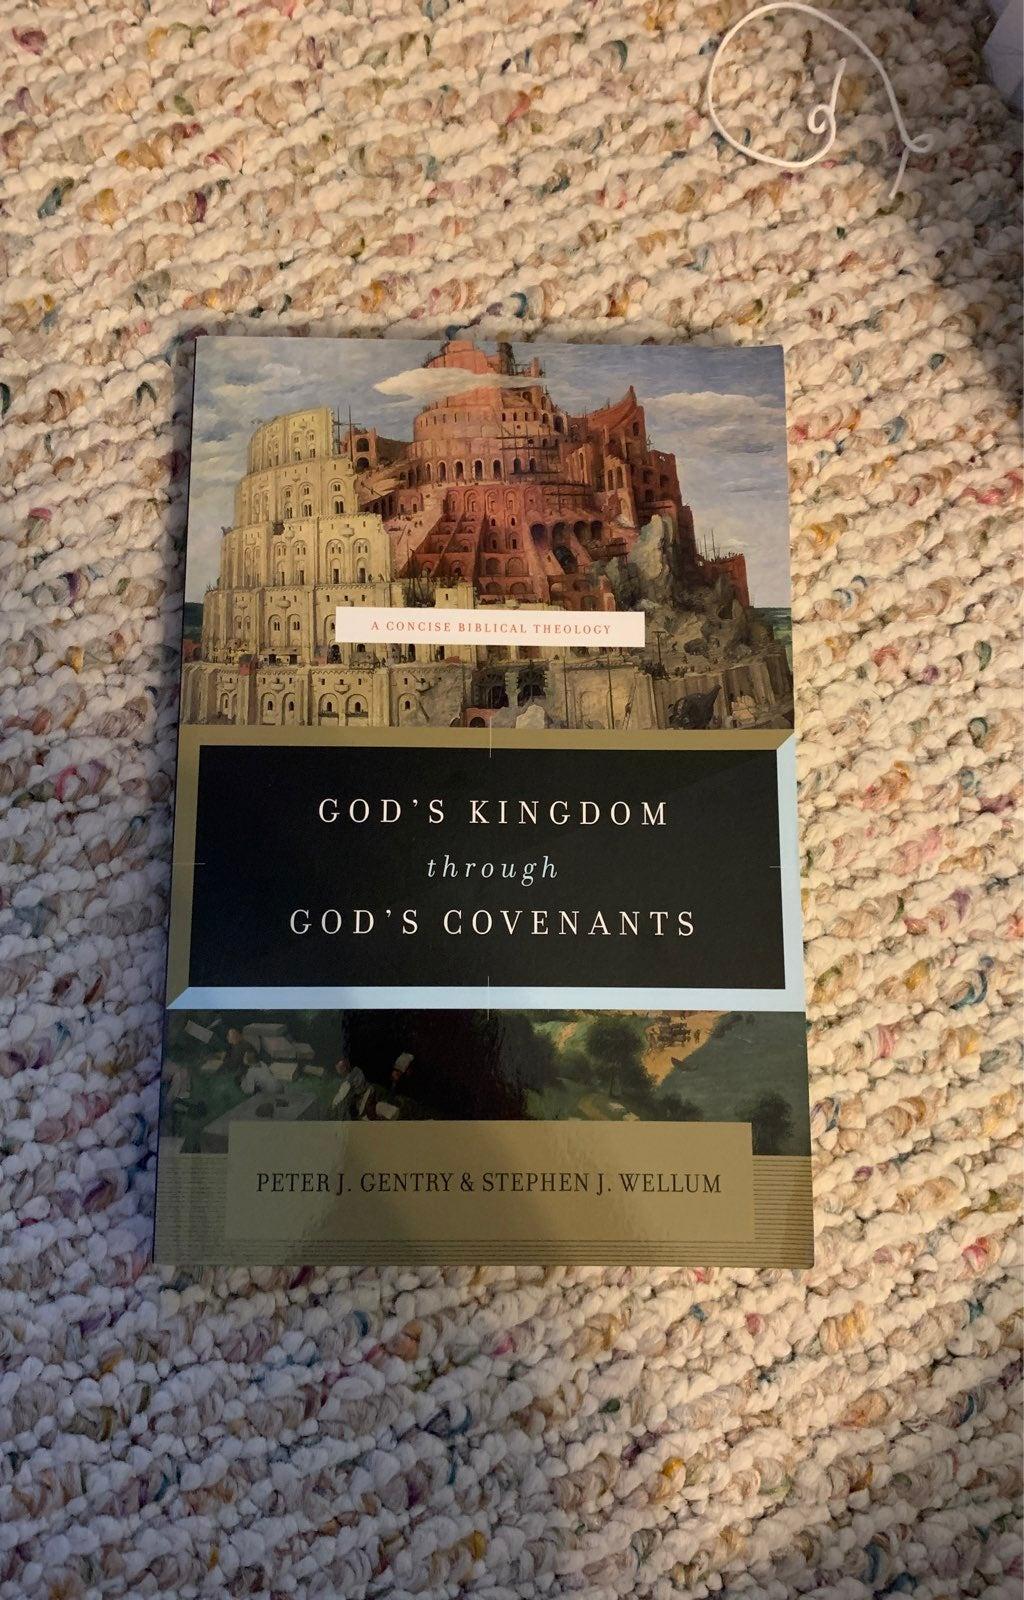 God's Kingdom through God's Covenants by